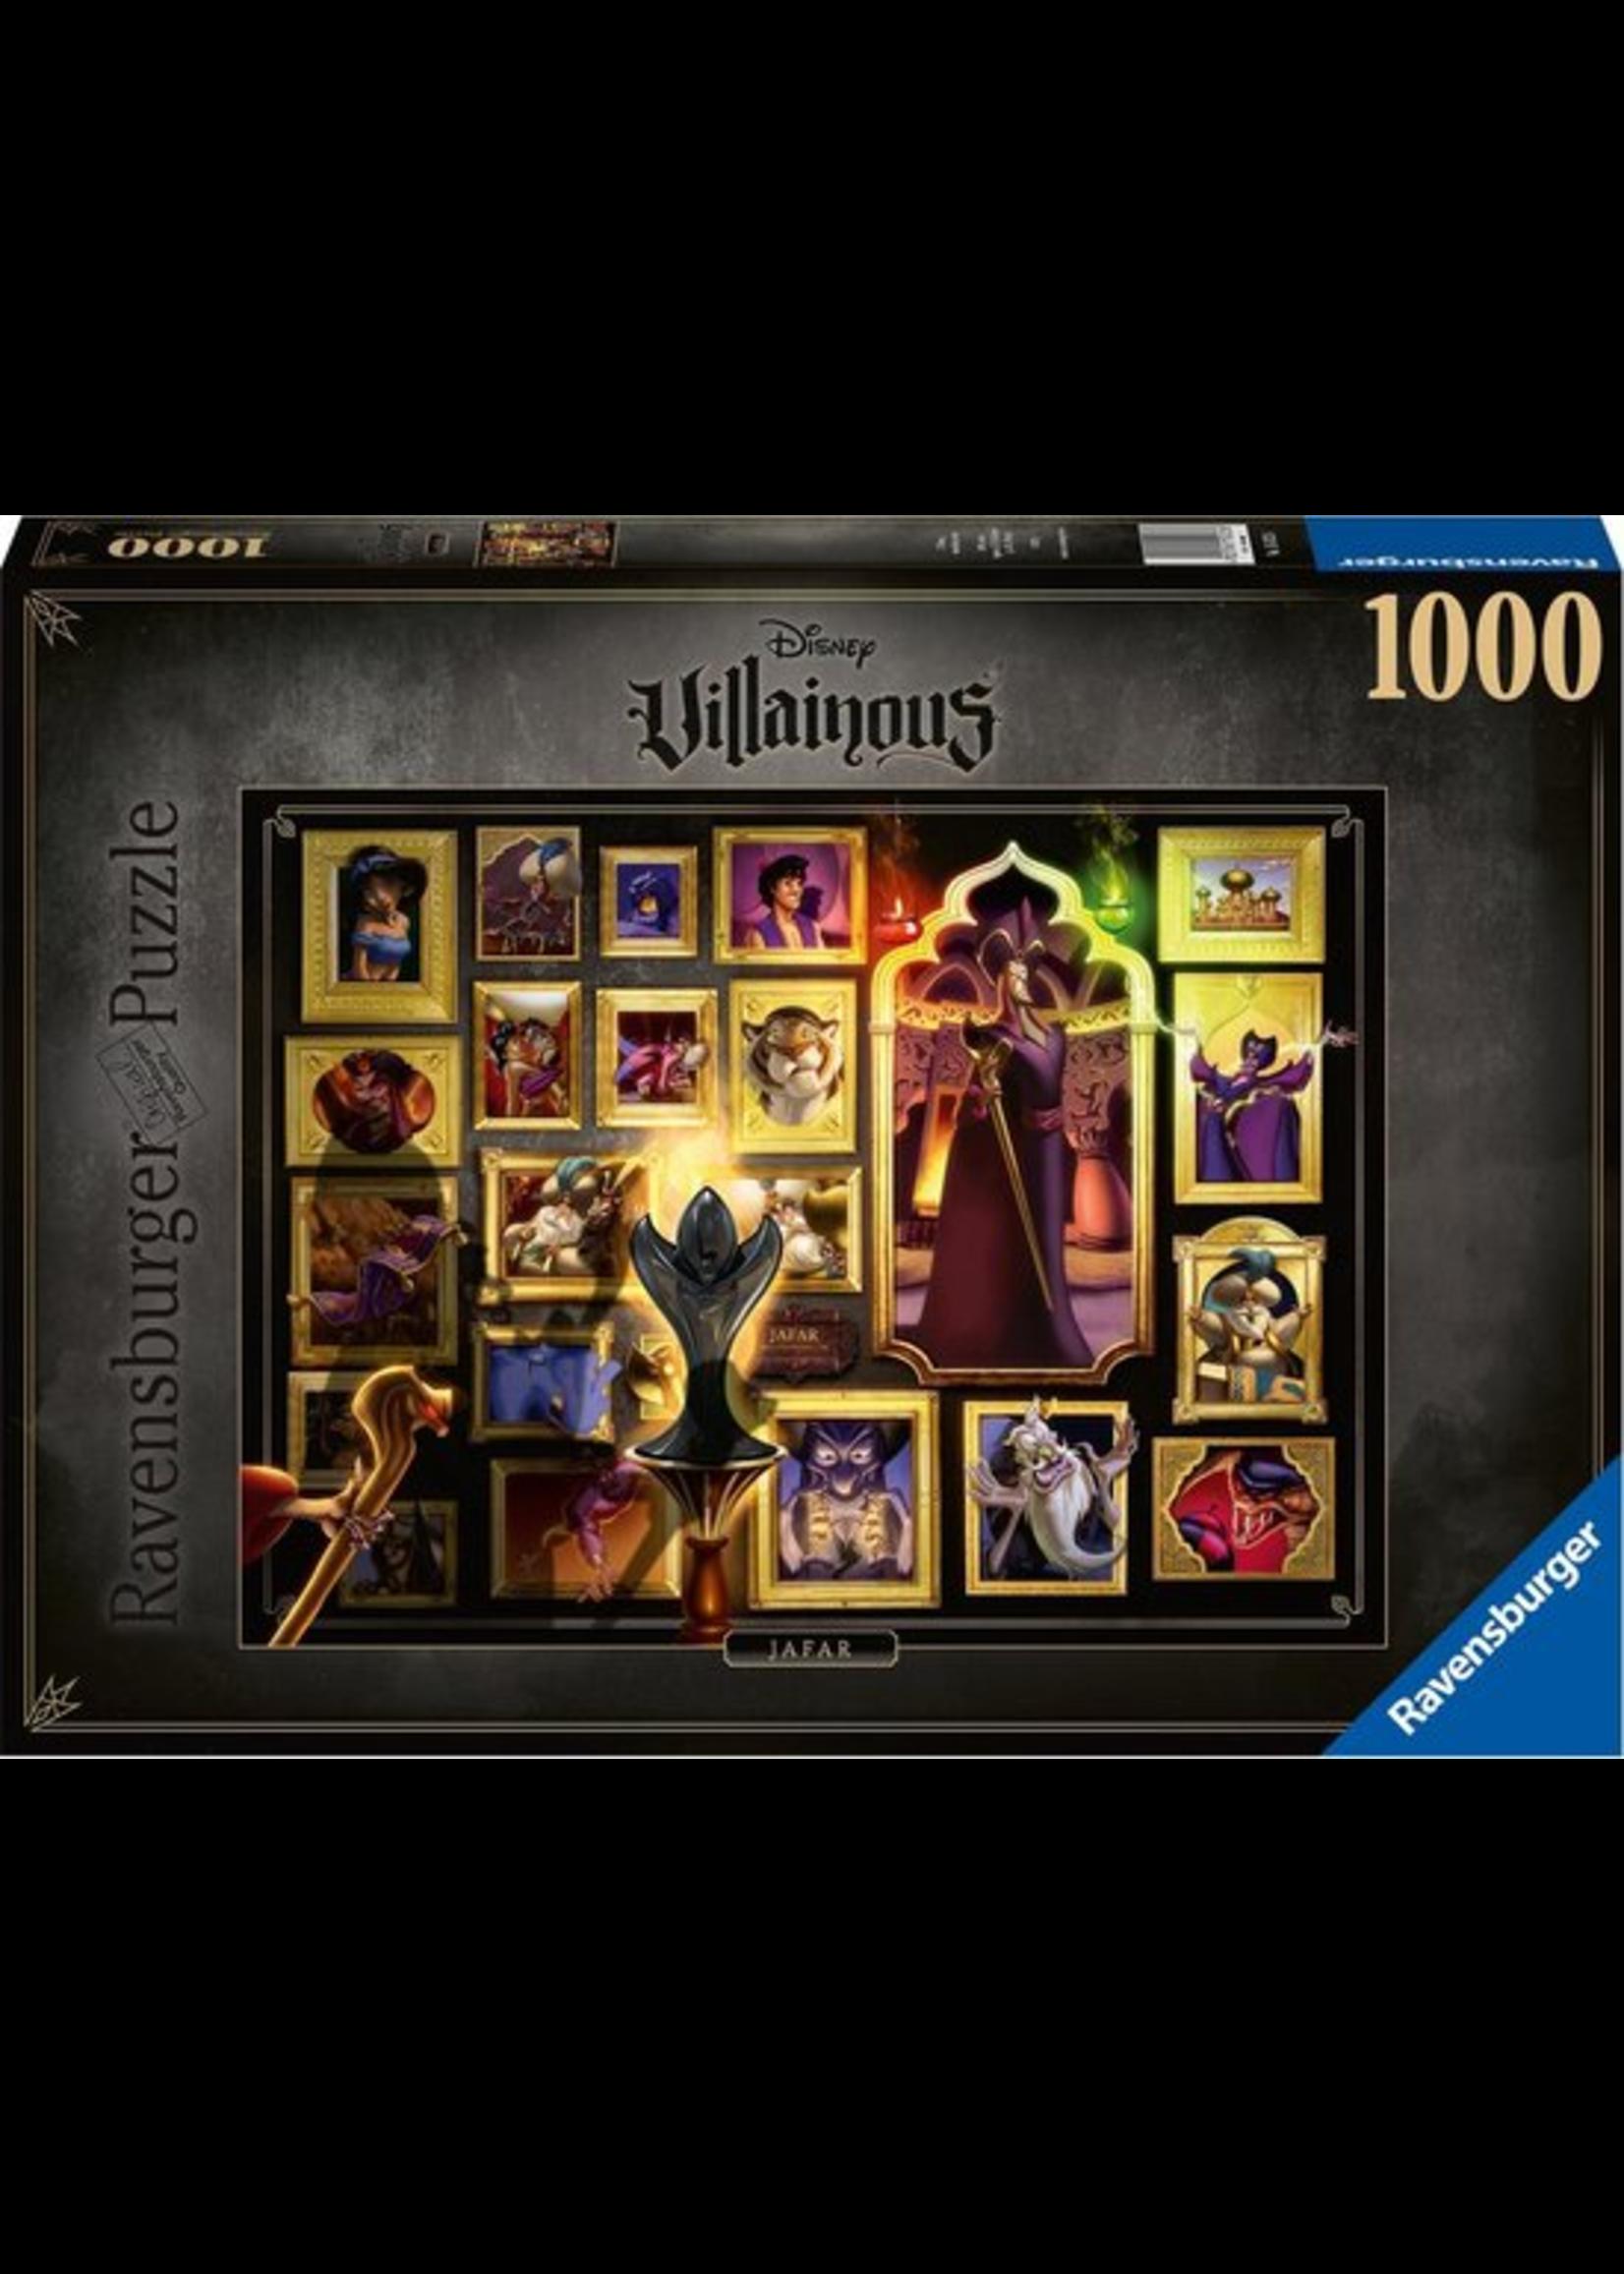 Disney Villainous - Jafar (1000)